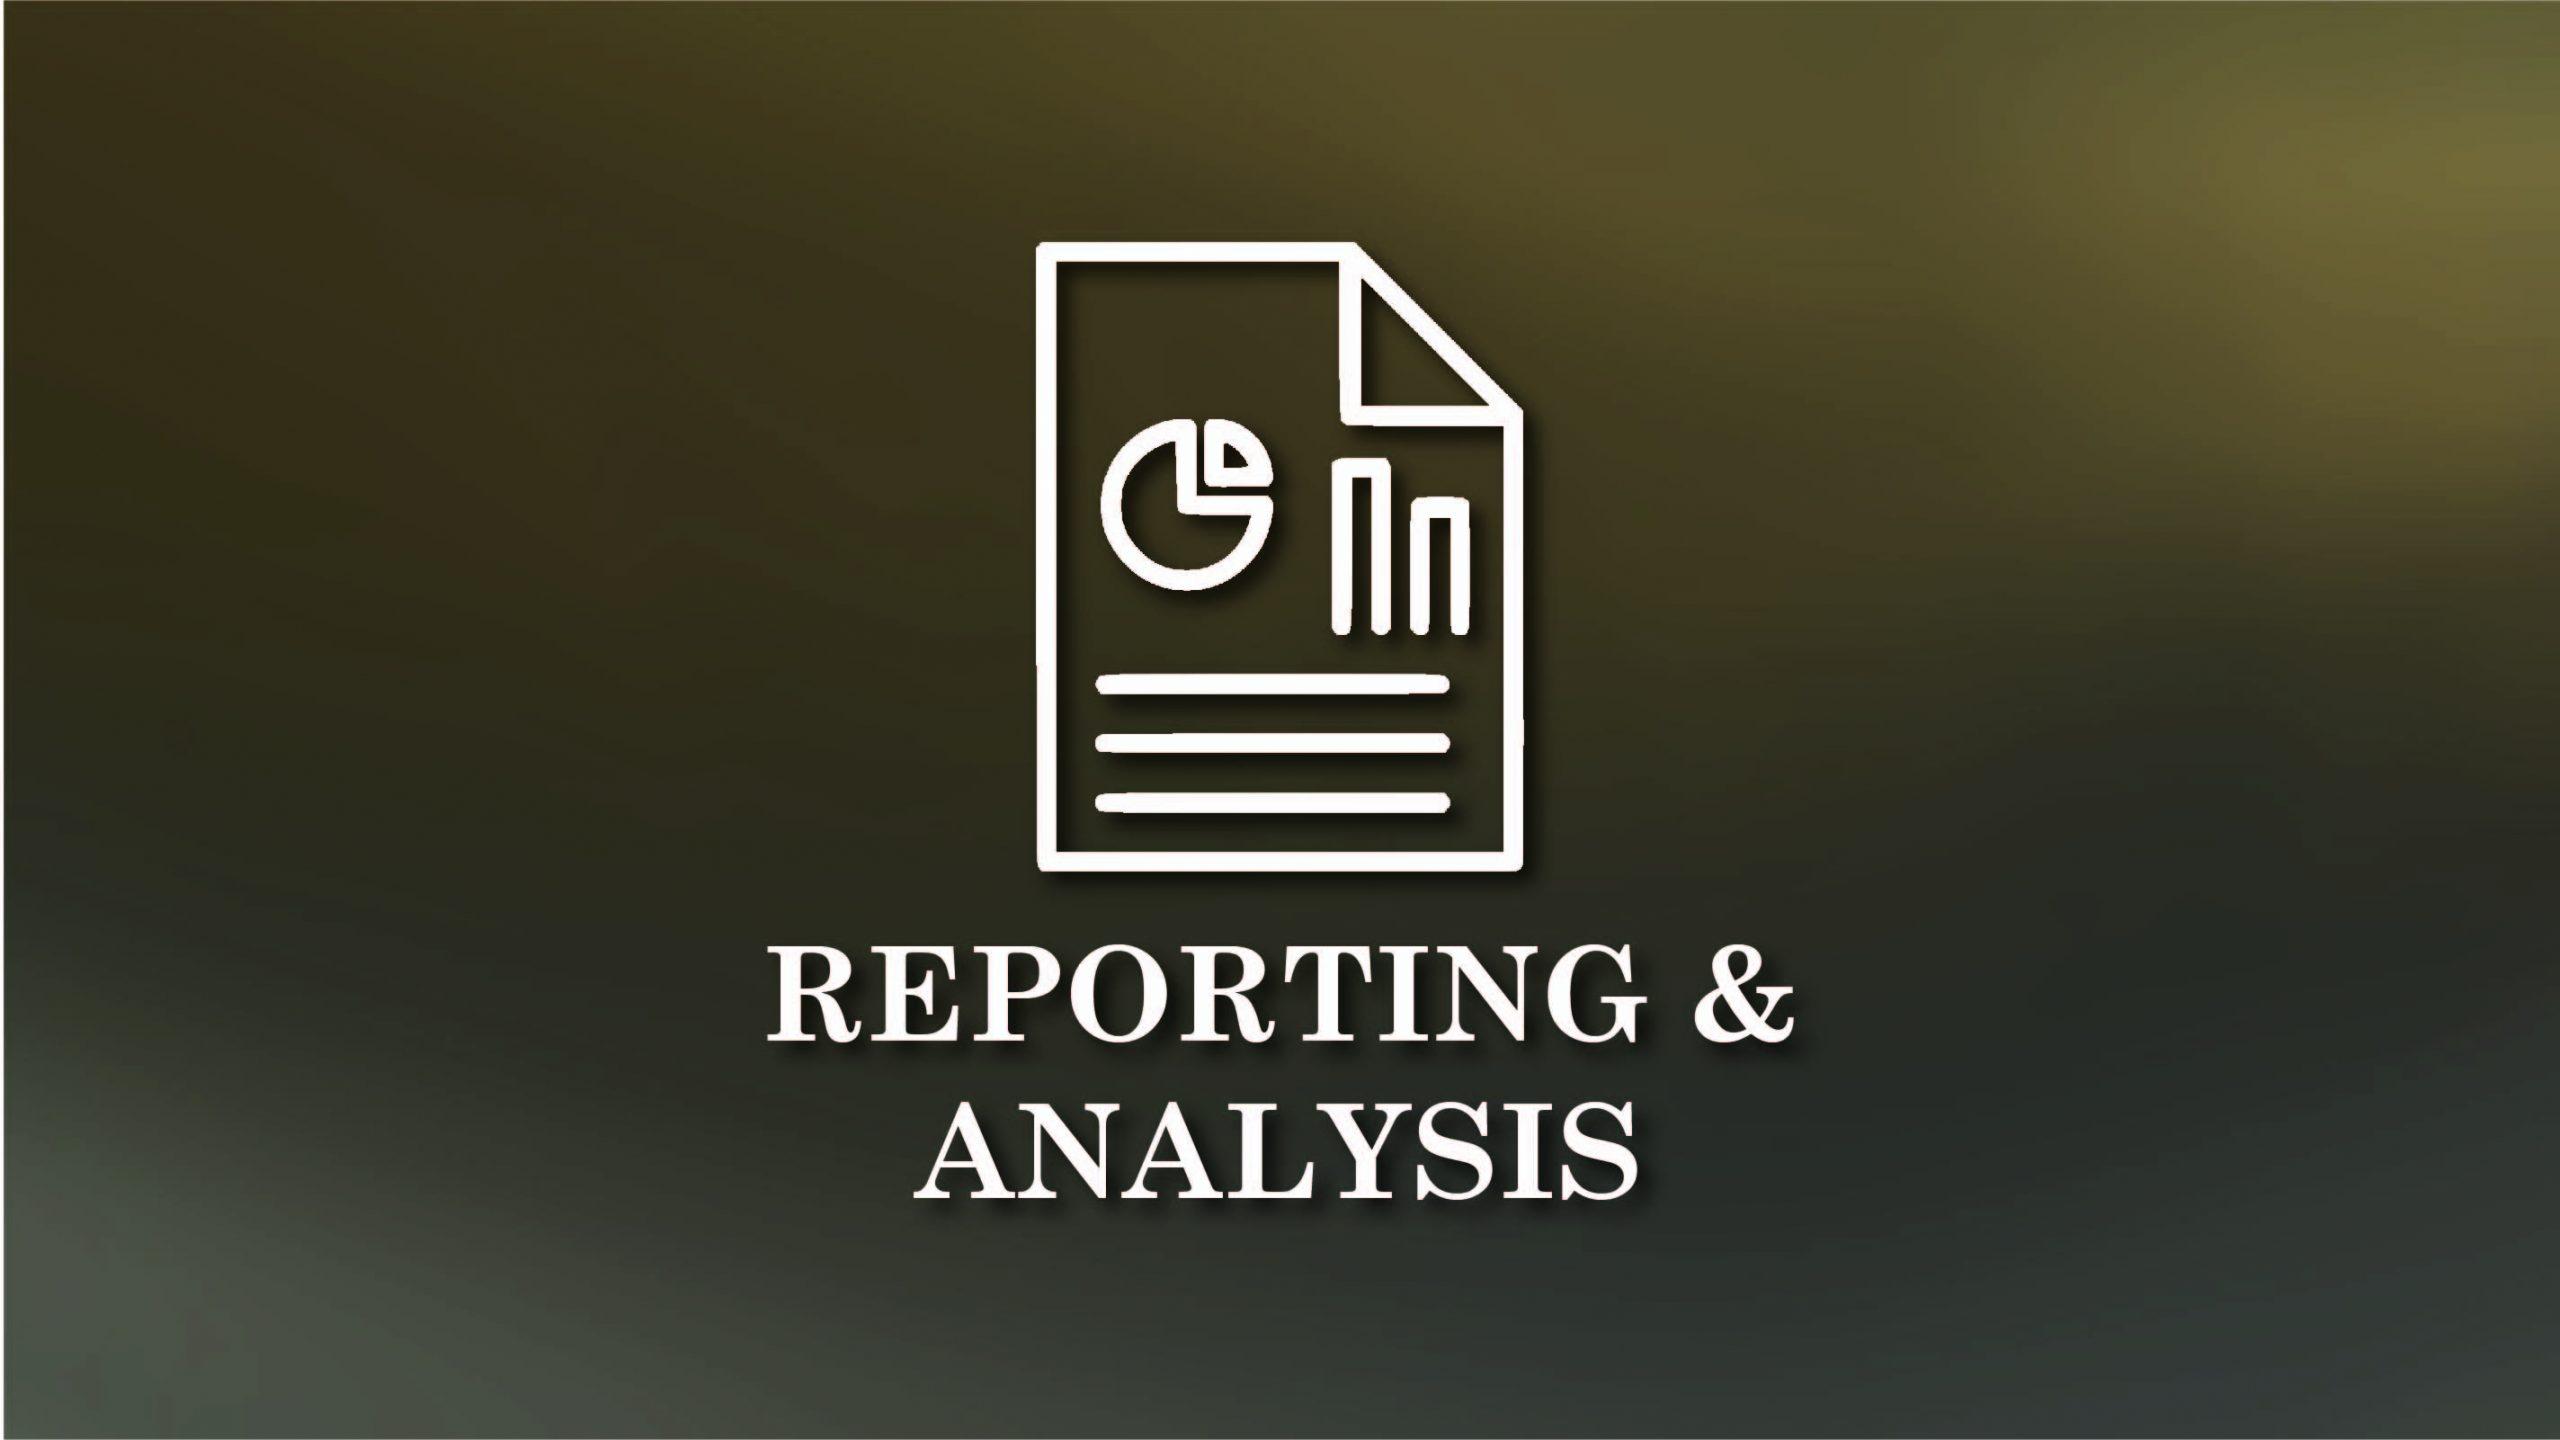 Reporting & Analysis